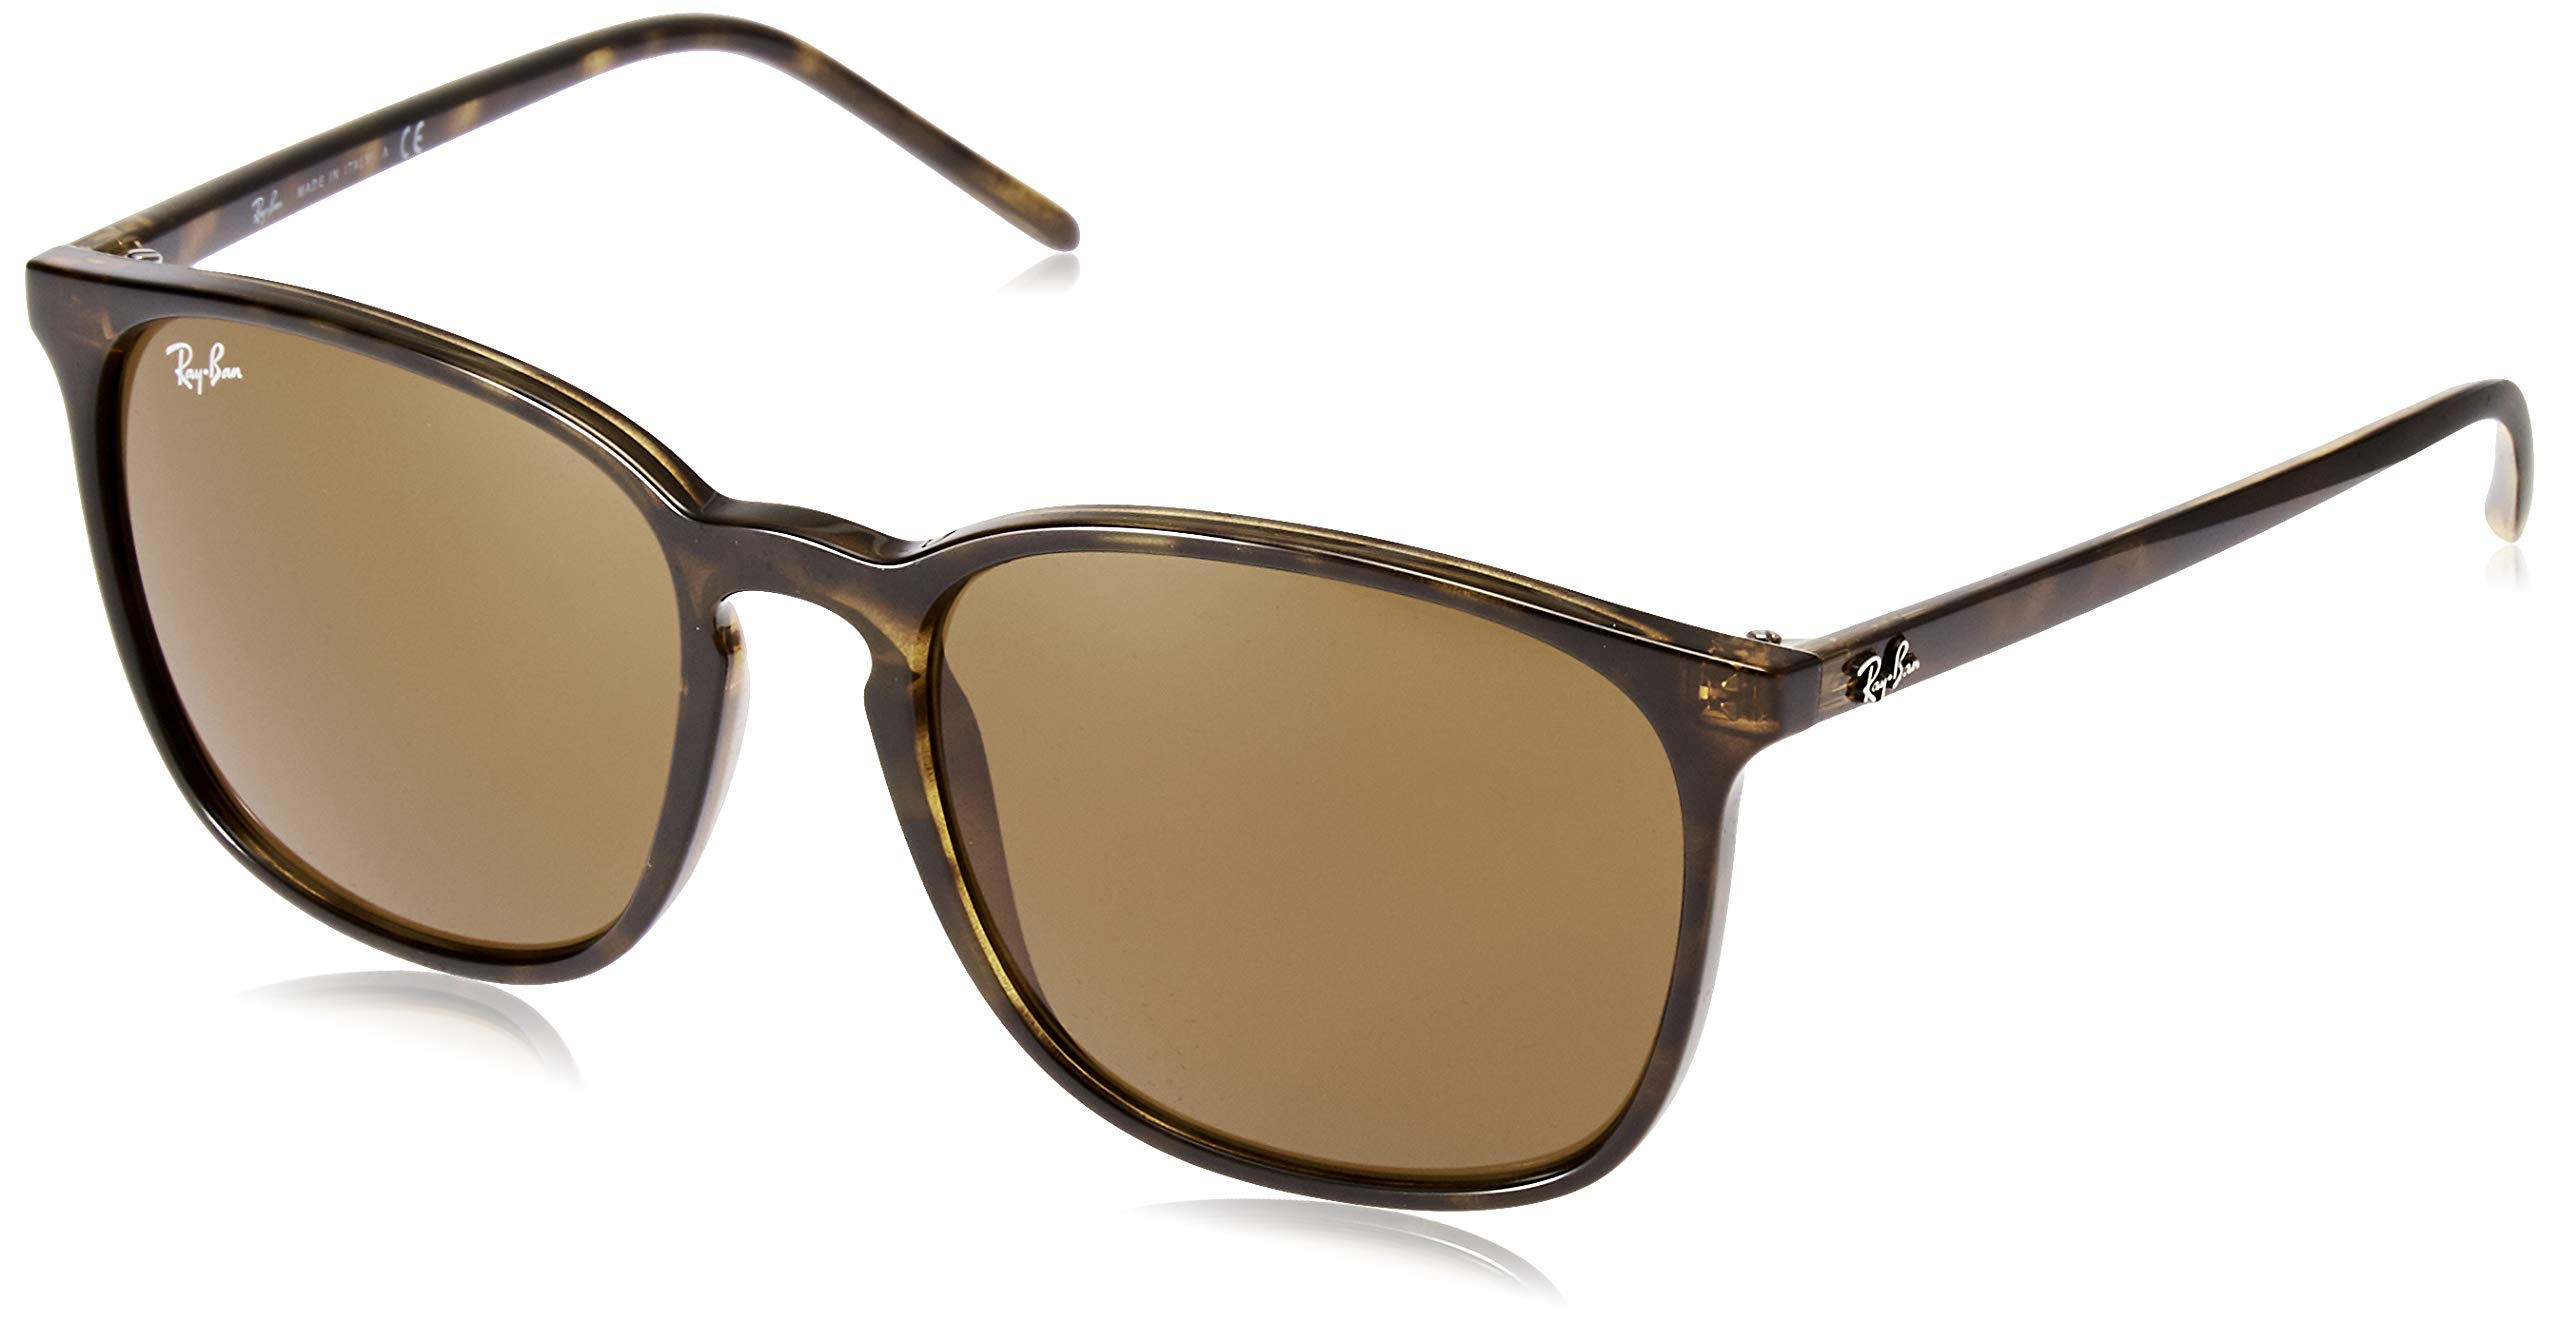 RAY-BAN RB4387 Round Sunglasses, Havana/Dark Brown, 56 mm by RAY-BAN